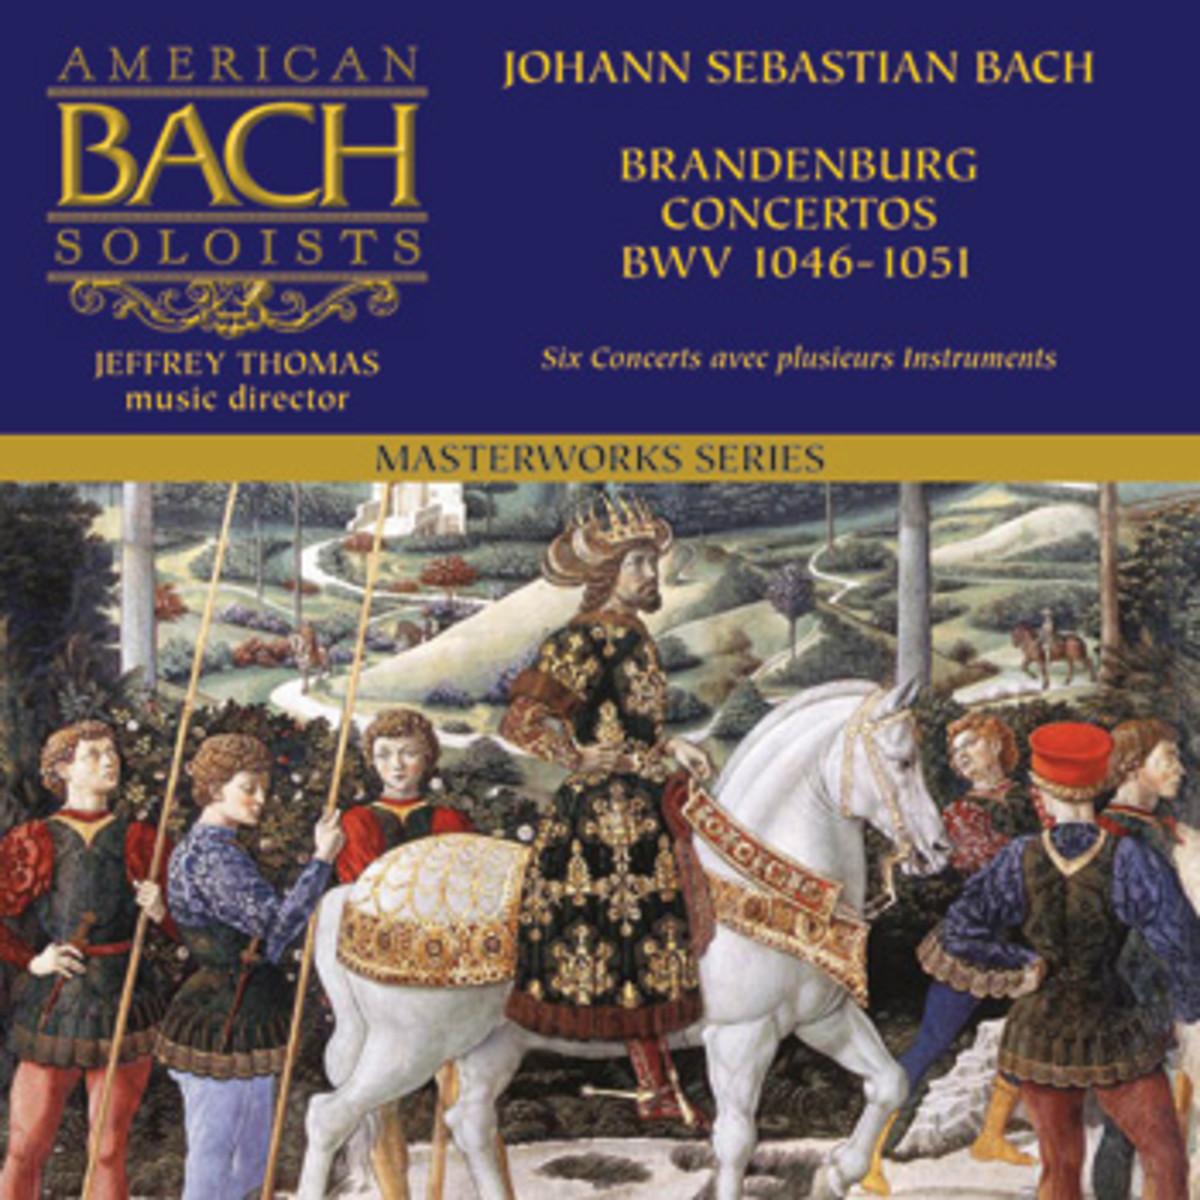 bachs-brandenburg-concerti